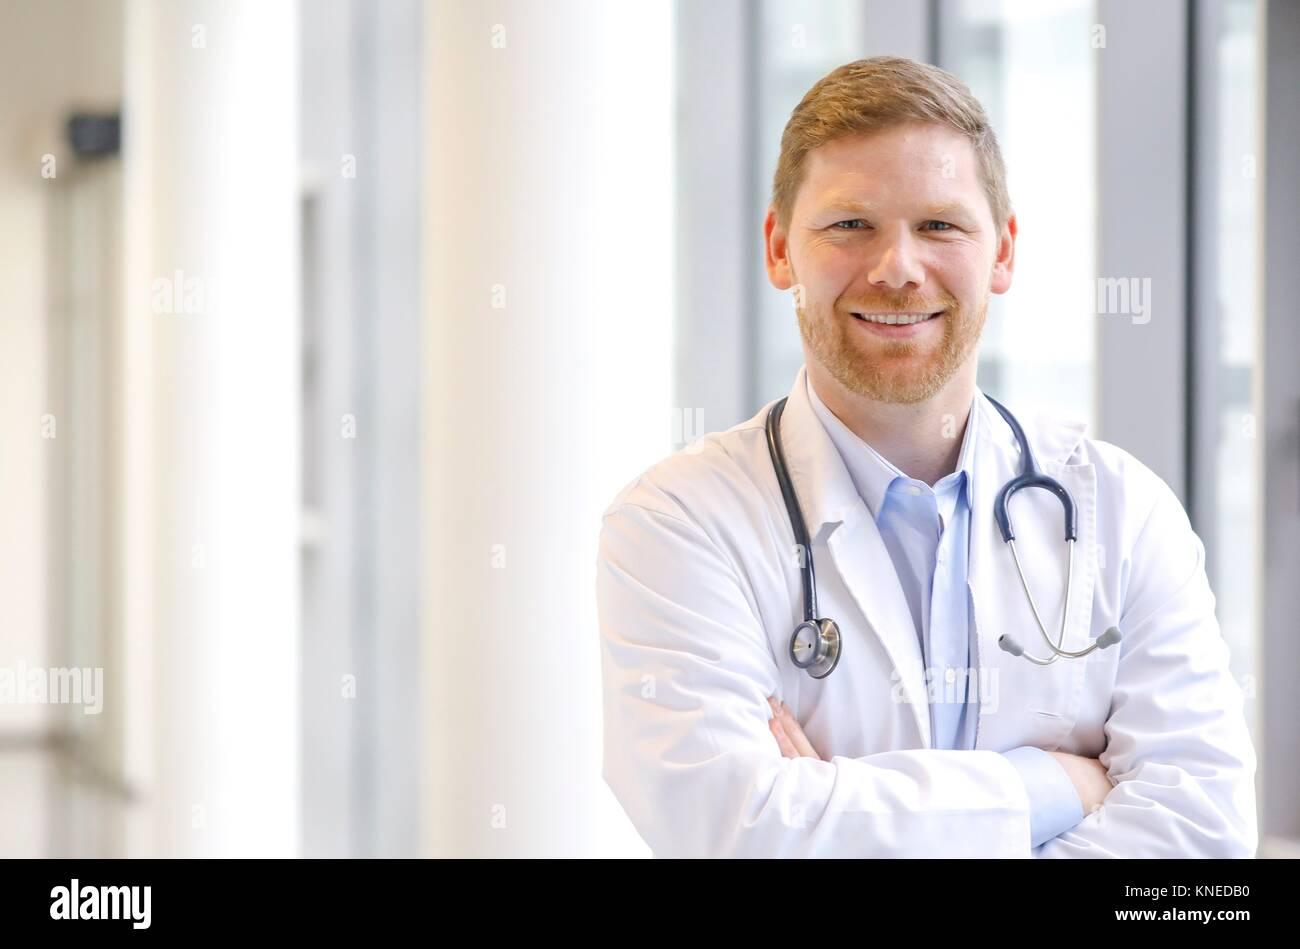 Doctor en el corredor, Hospital Imagen De Stock